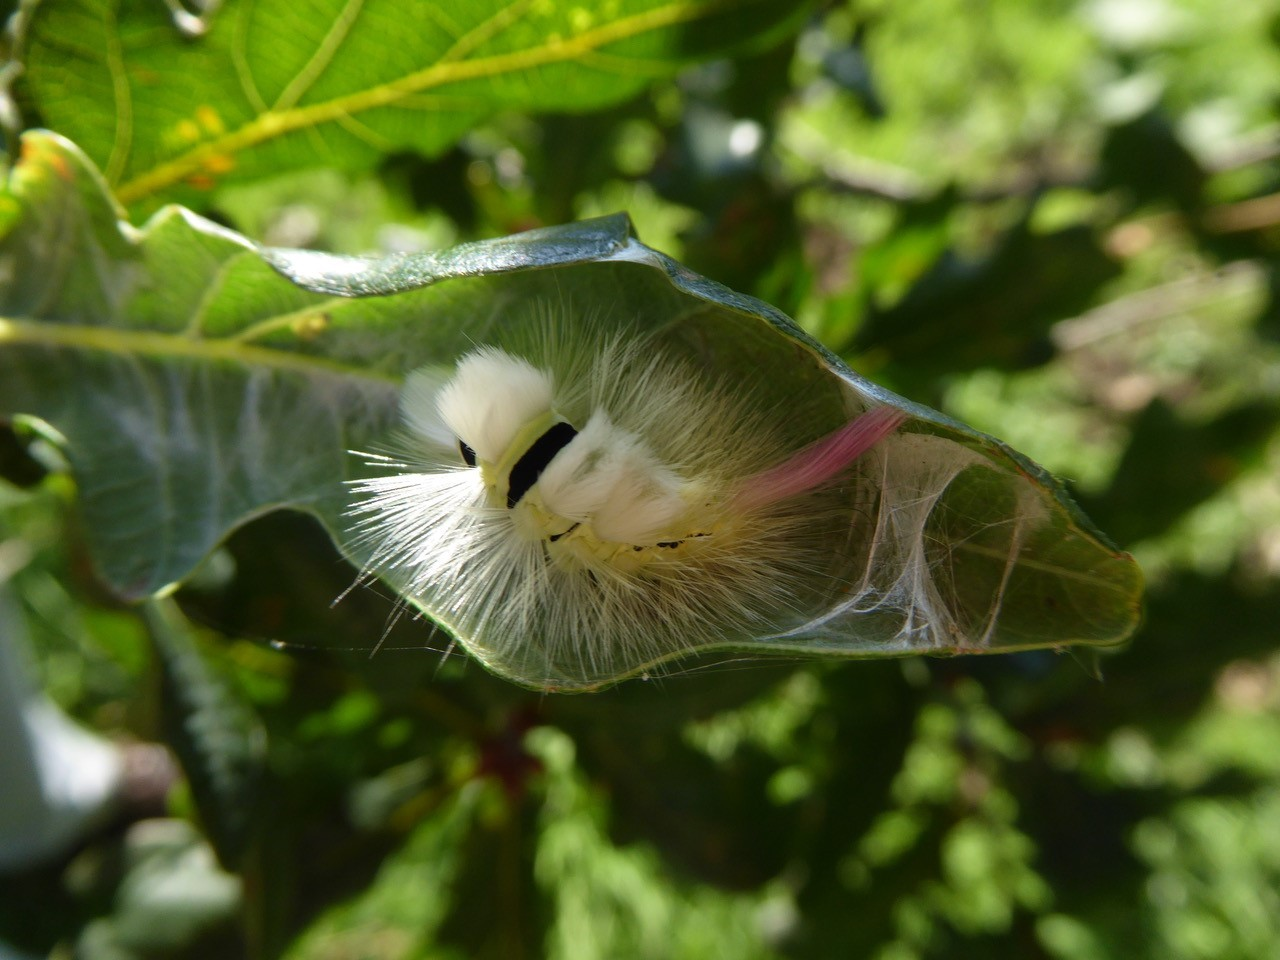 Calliteara pudibunda - Pale Tussock (caterpillar), Intake, Doncaster